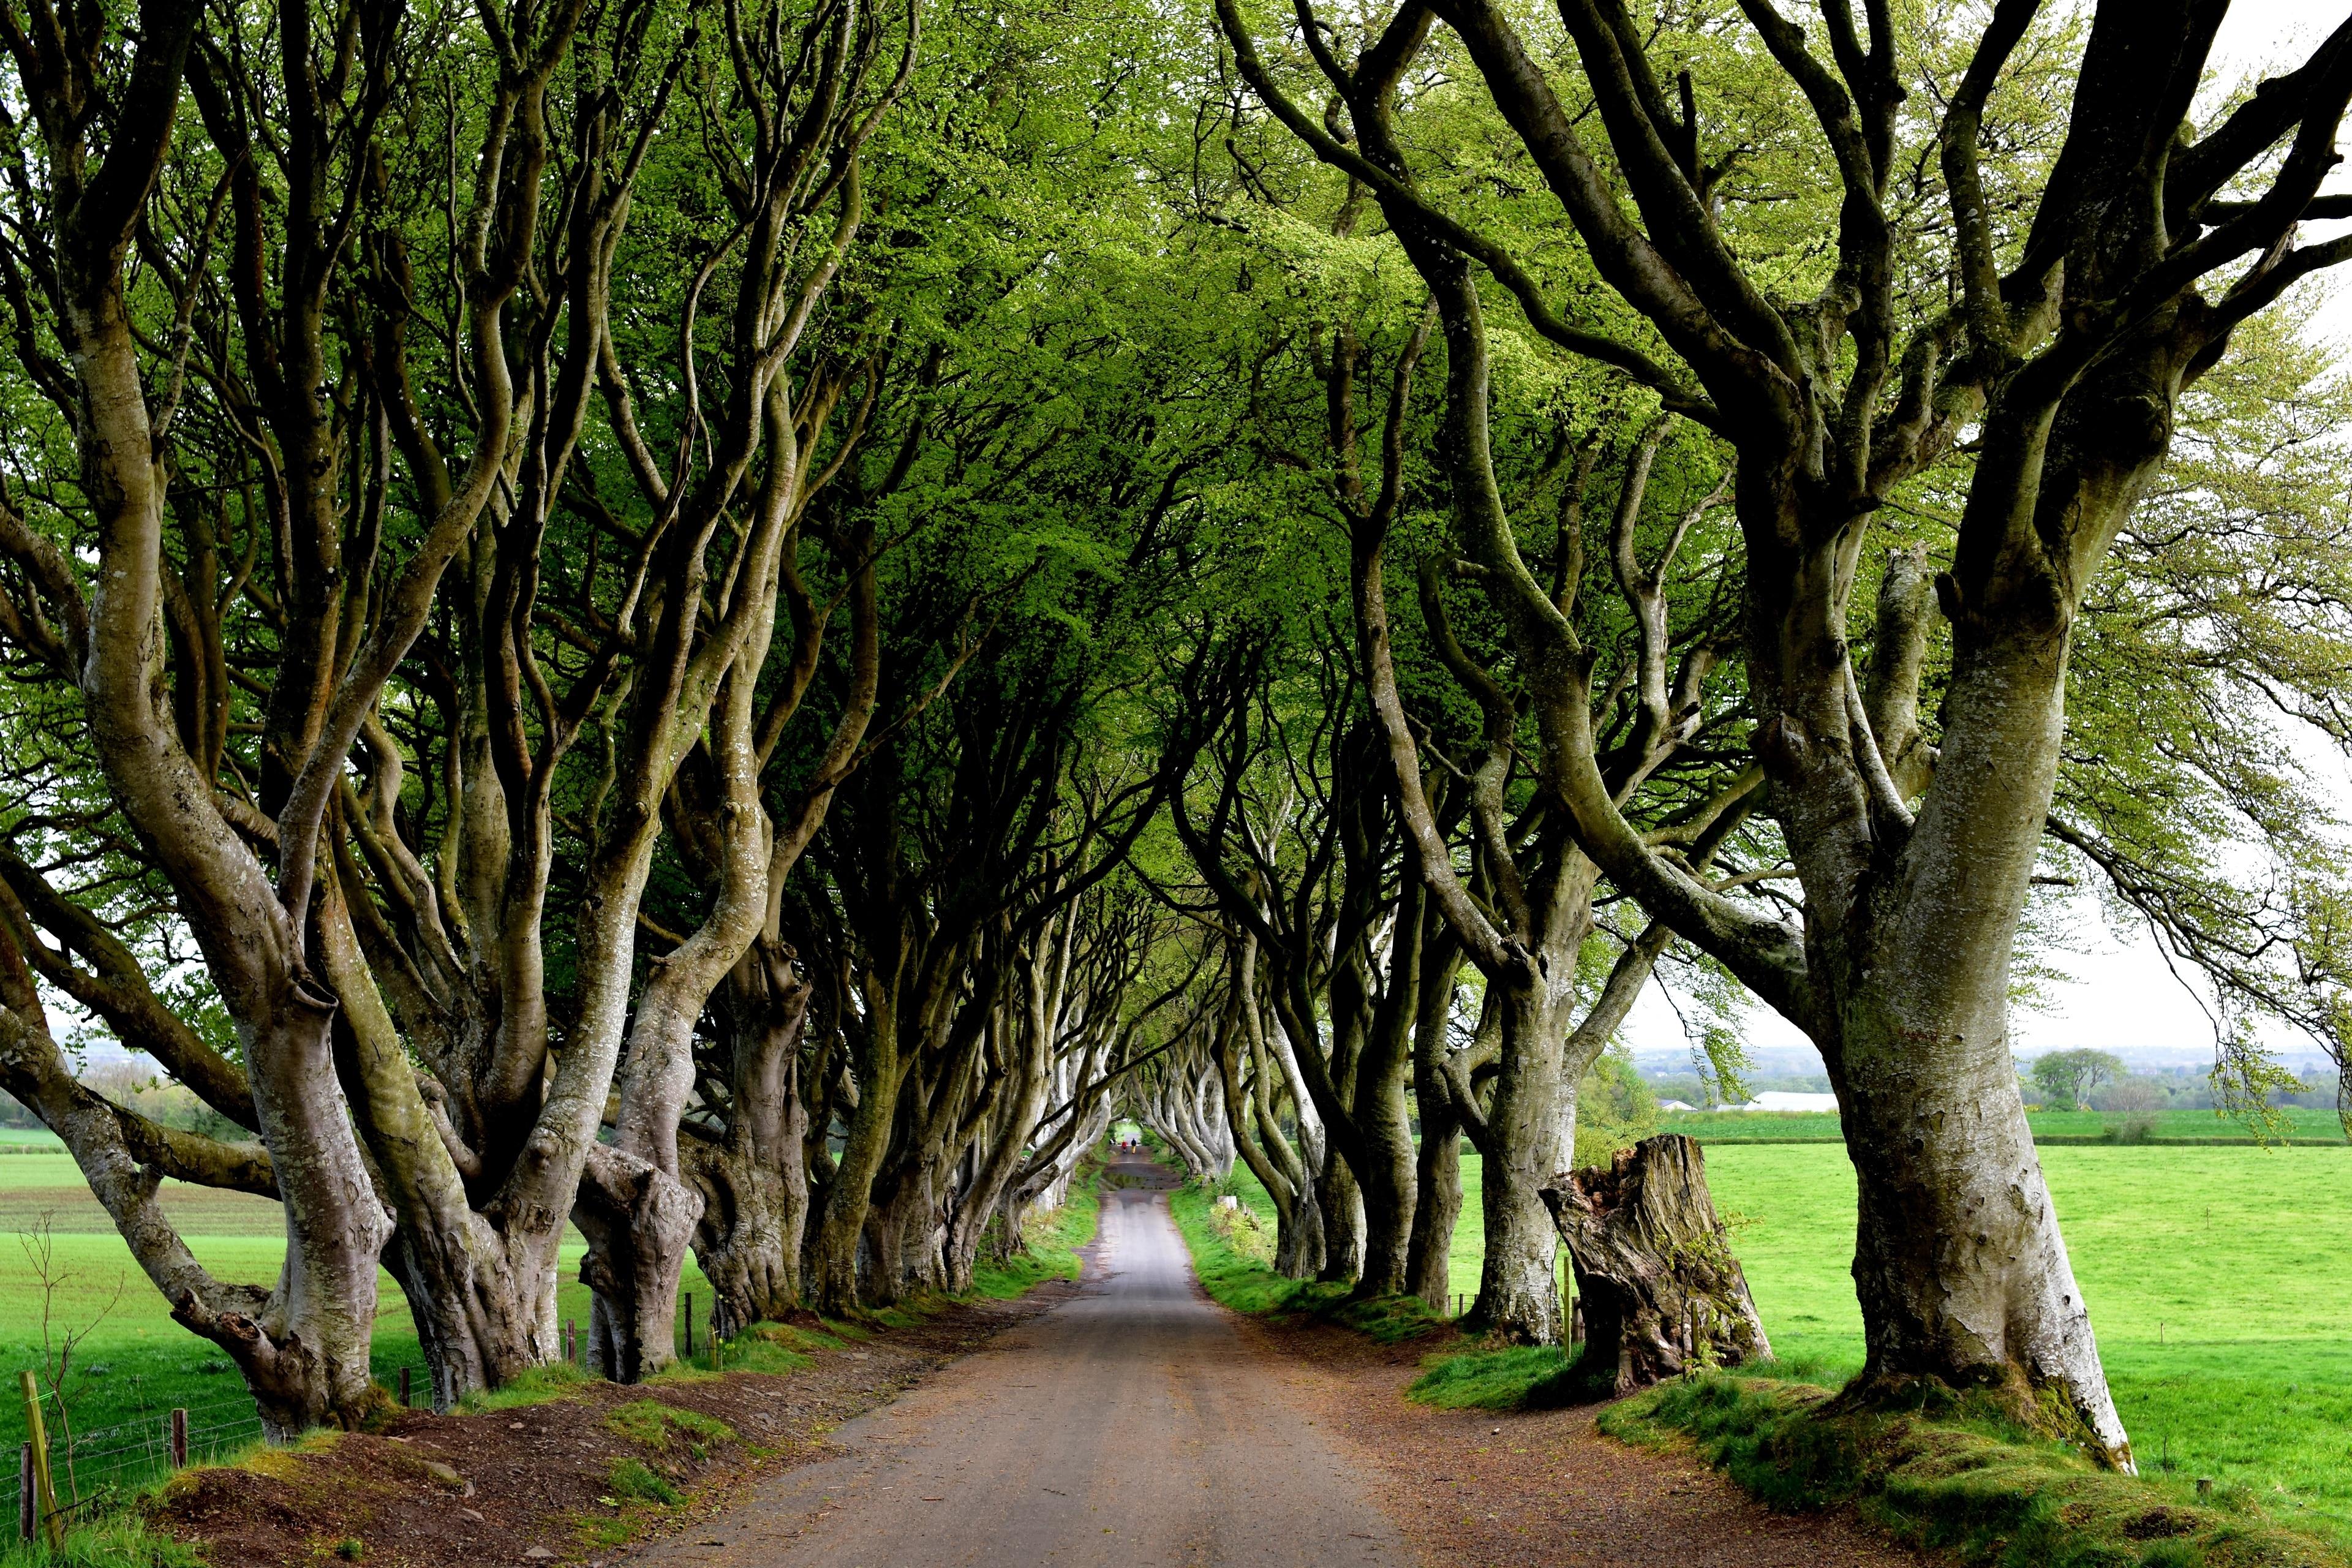 Ballymoney, Northern Ireland, United Kingdom